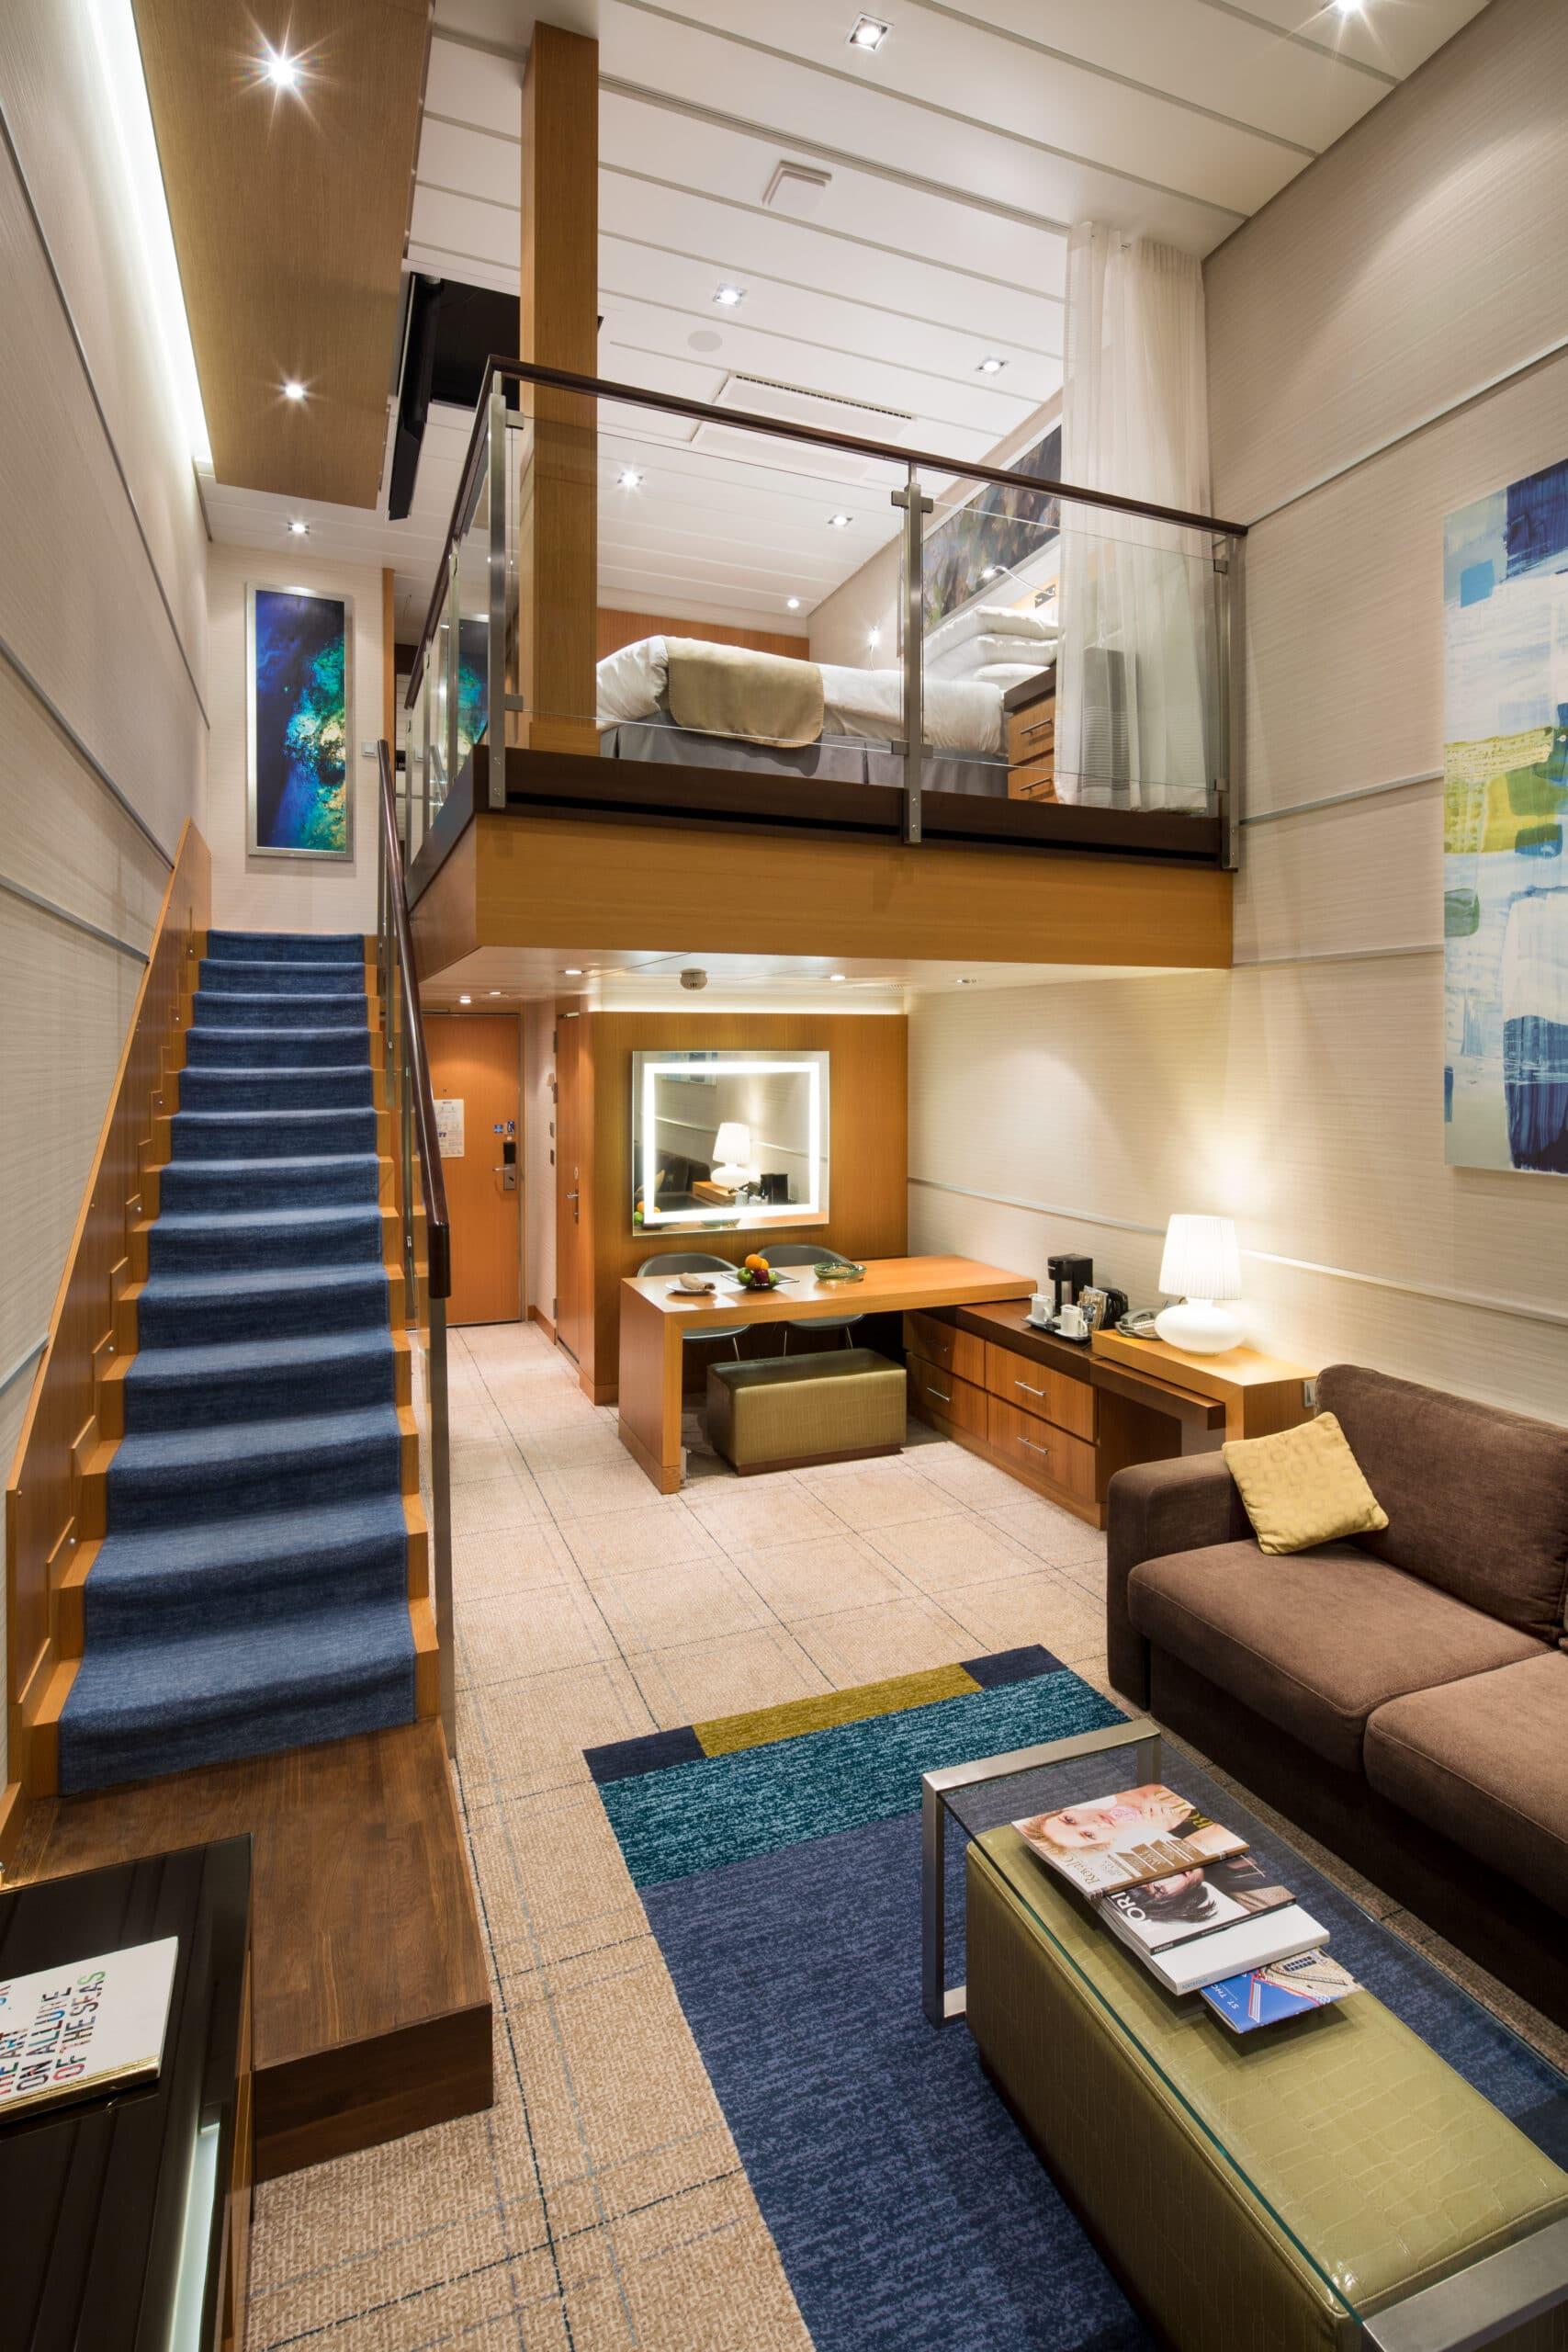 Royal-Caribbean-International-Allure-of-the-Seas-Oasis-of-the-seas-schip-cruiseschip-categorie-L1-Crown-Loft-Suites